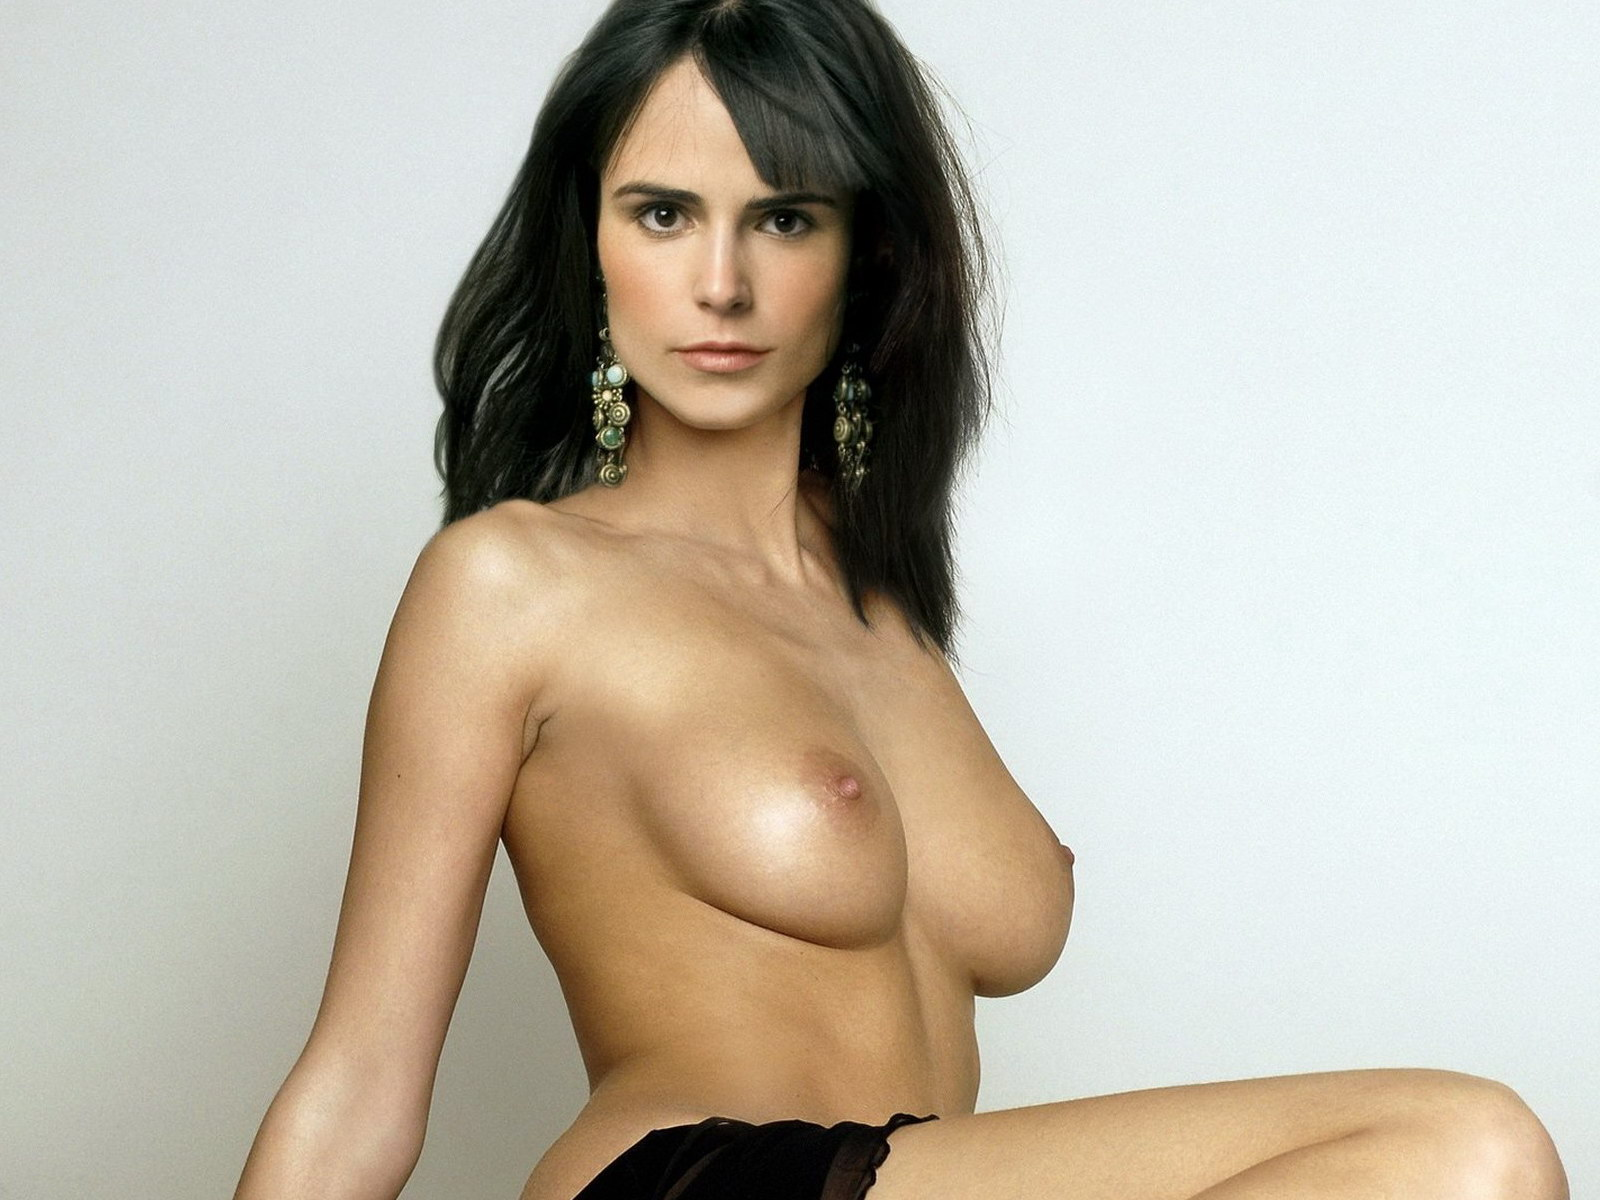 Hard sex jordana brewster nude sex free porn pics on cutemom nakedgirlfuck